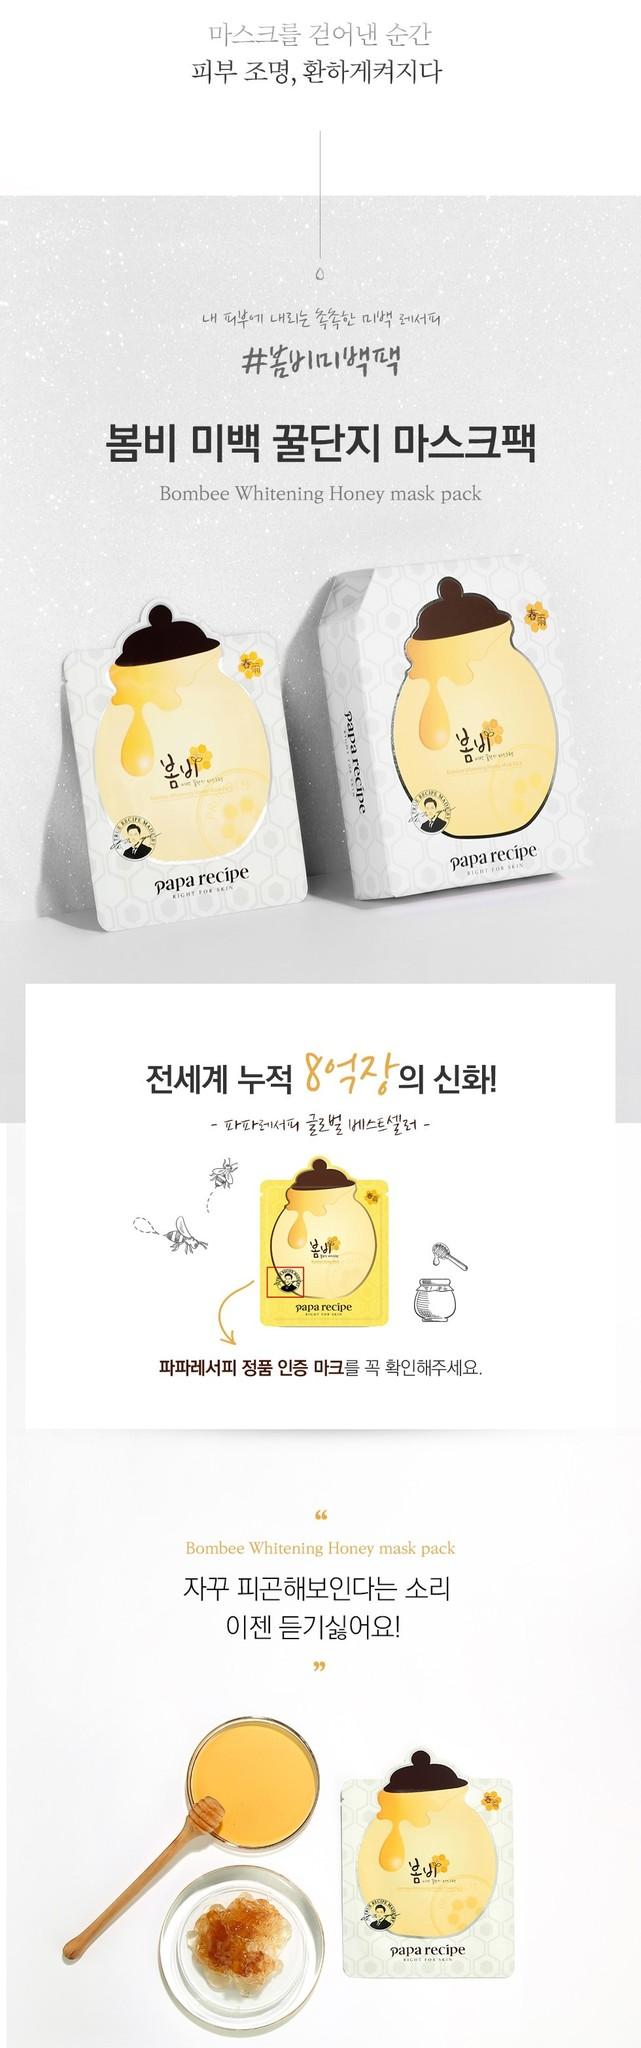 Bombee Whitening Honey Mask-2